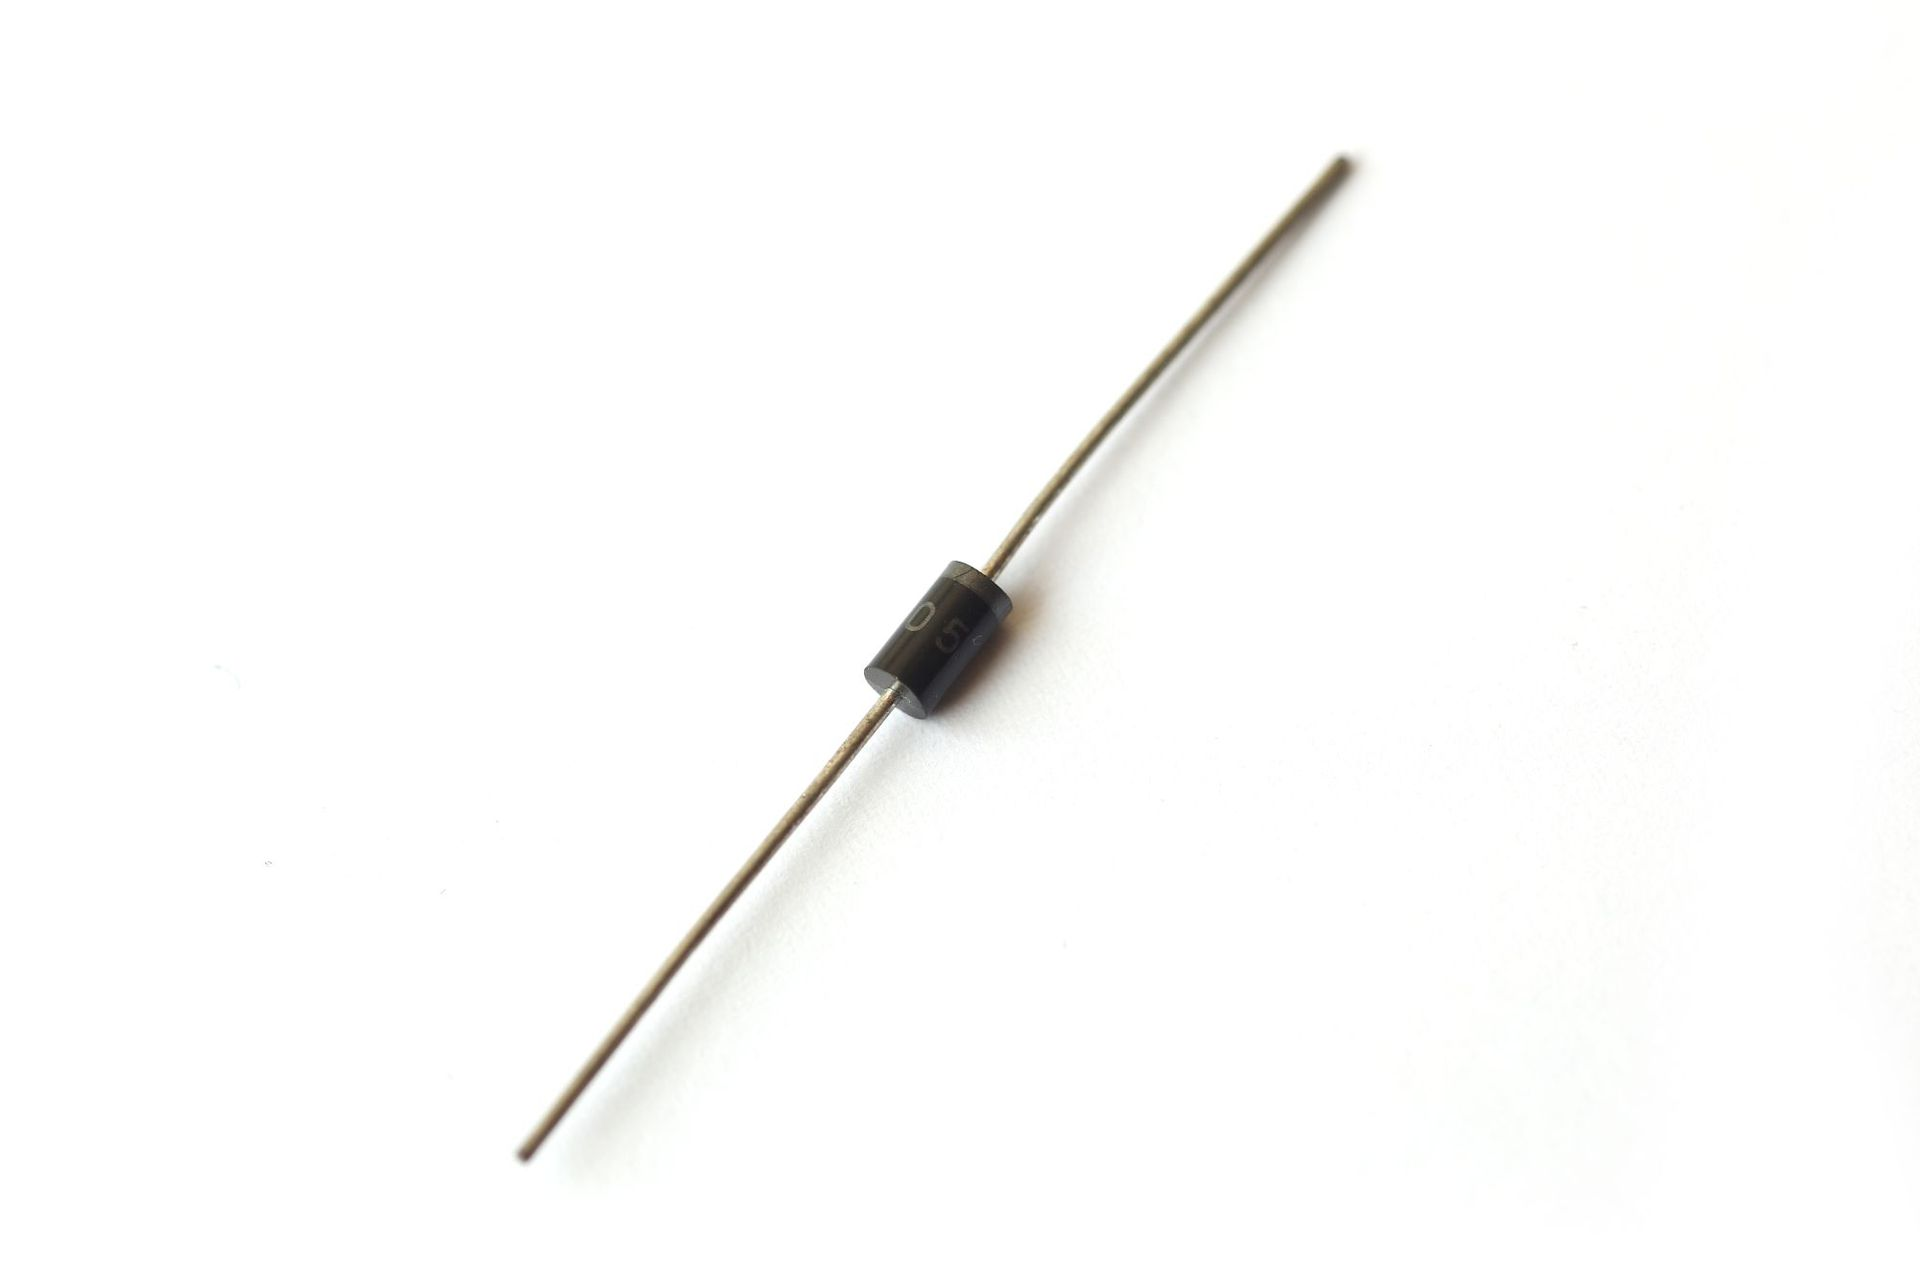 SIDAC触发管 K200 K220 K240 K250-灯具触发器电路专用